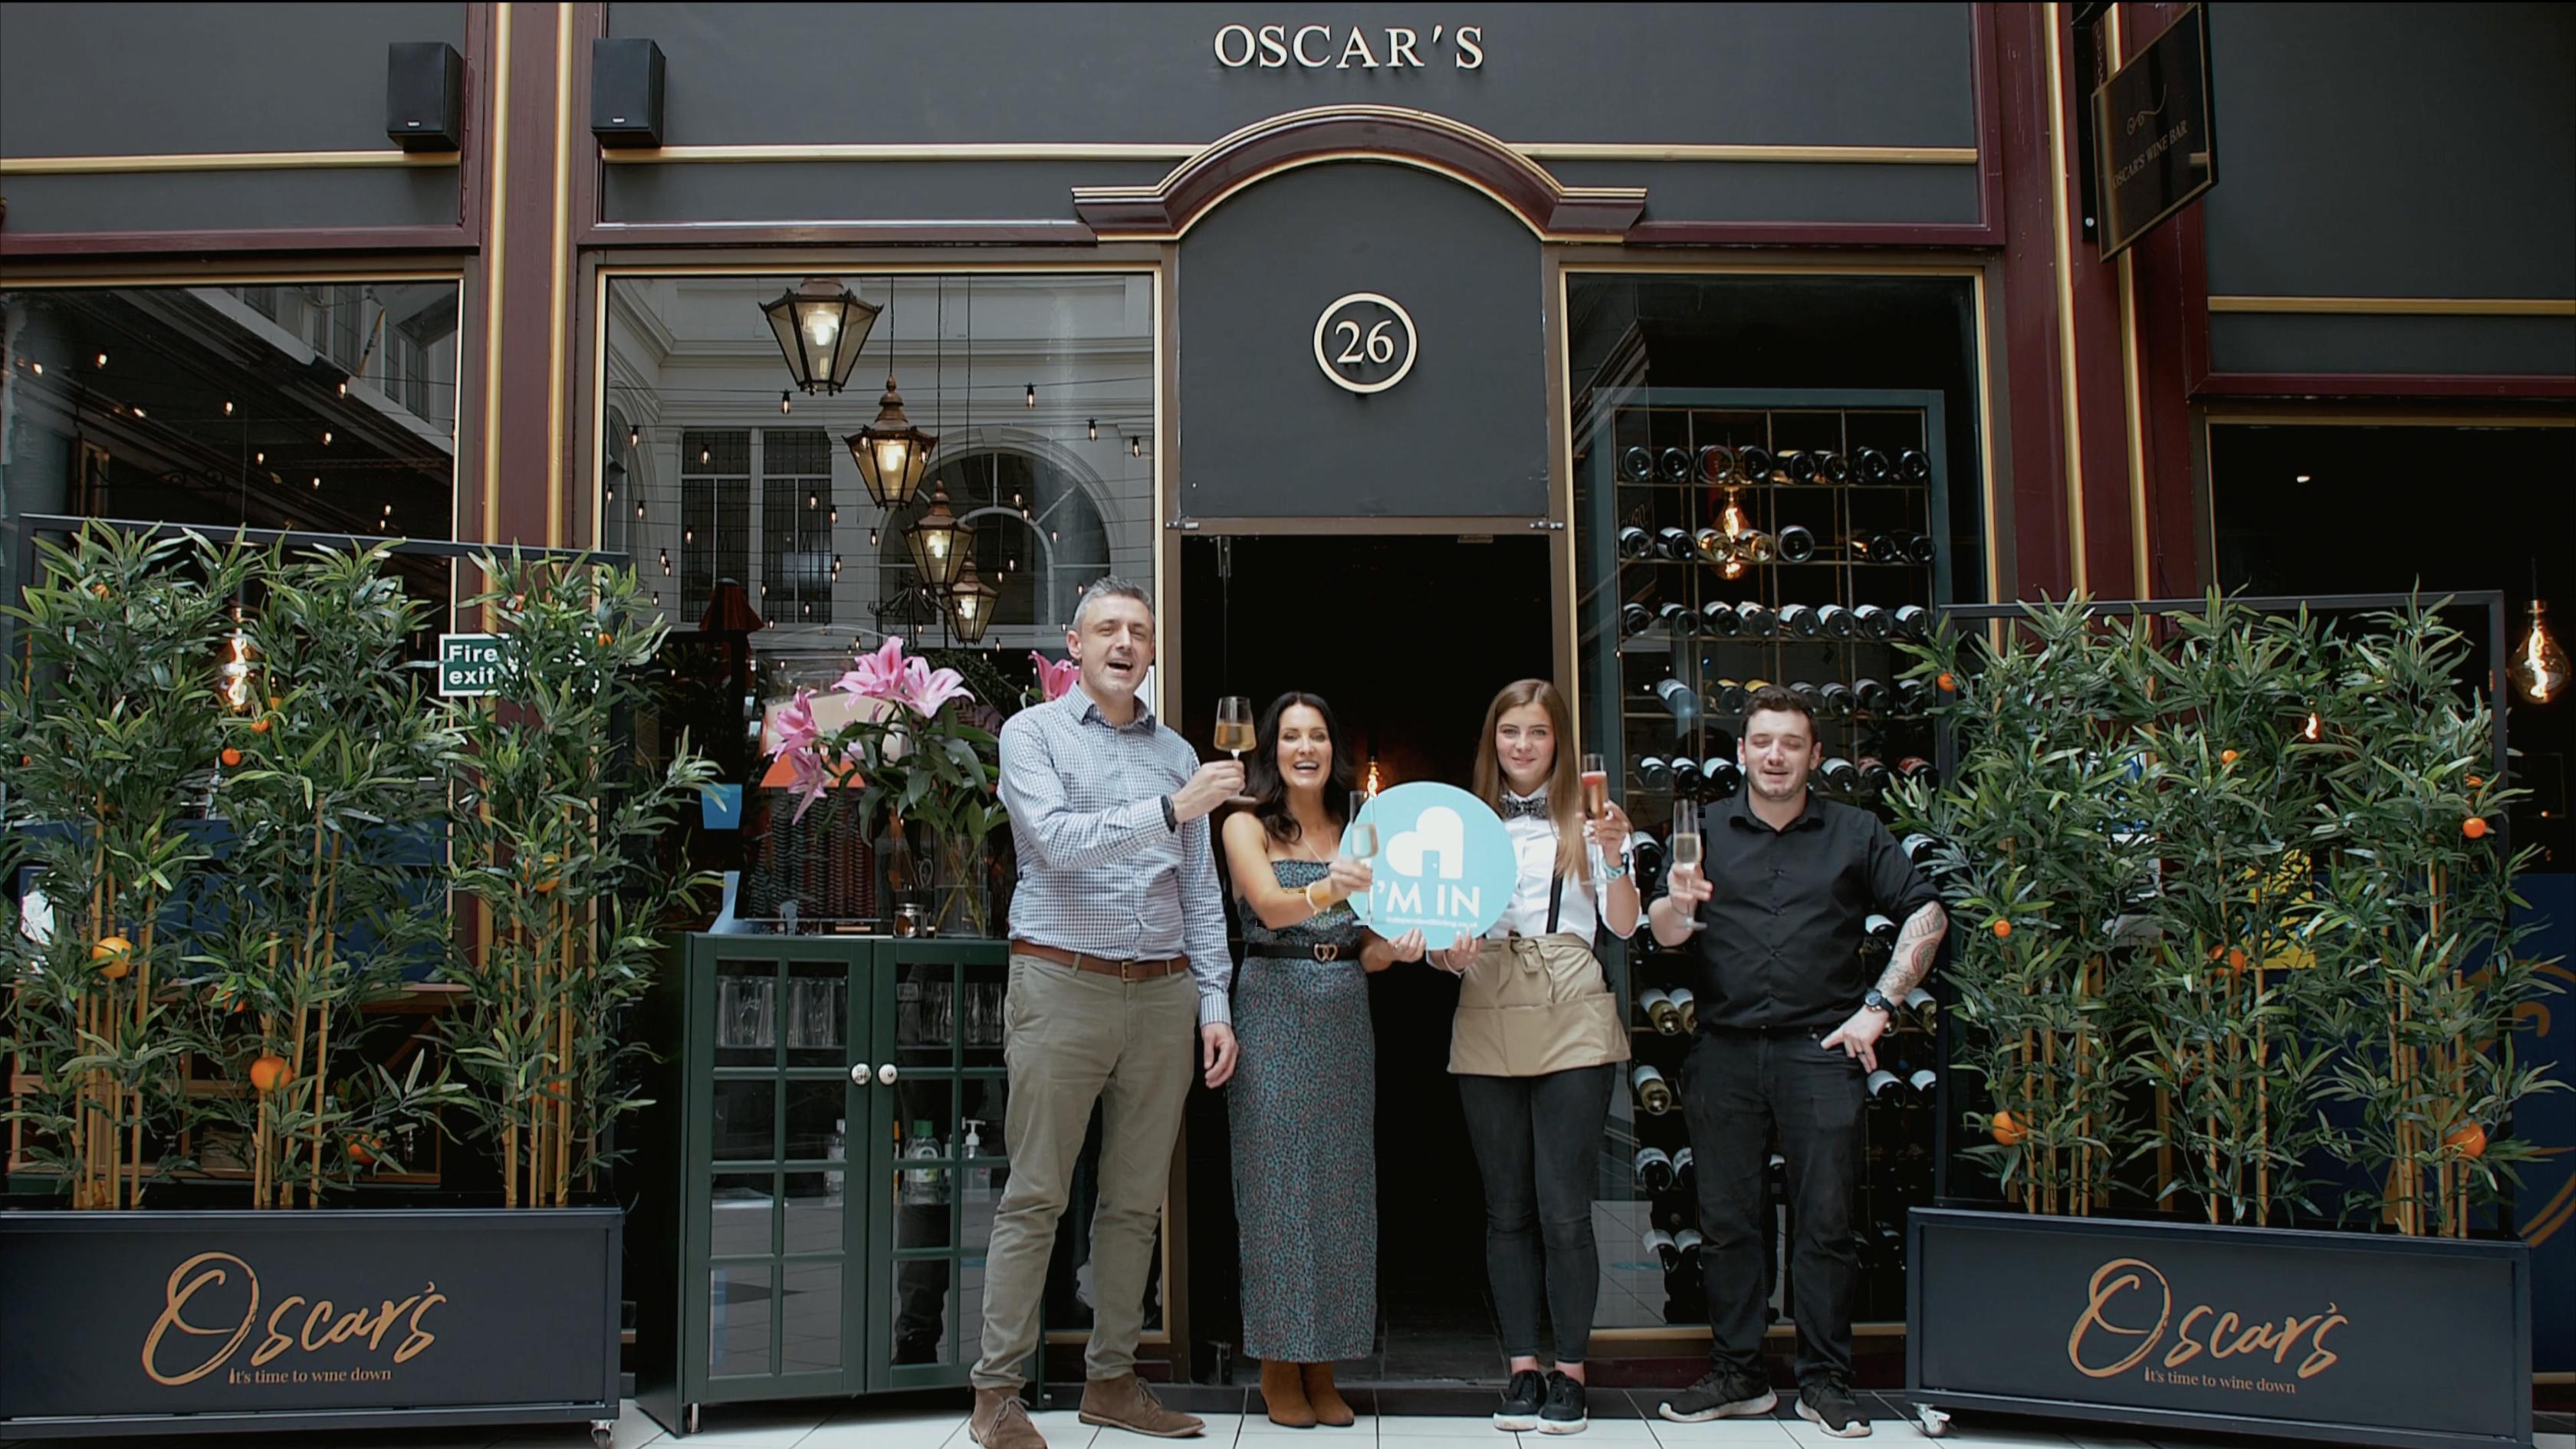 Oscar's Wine Bar